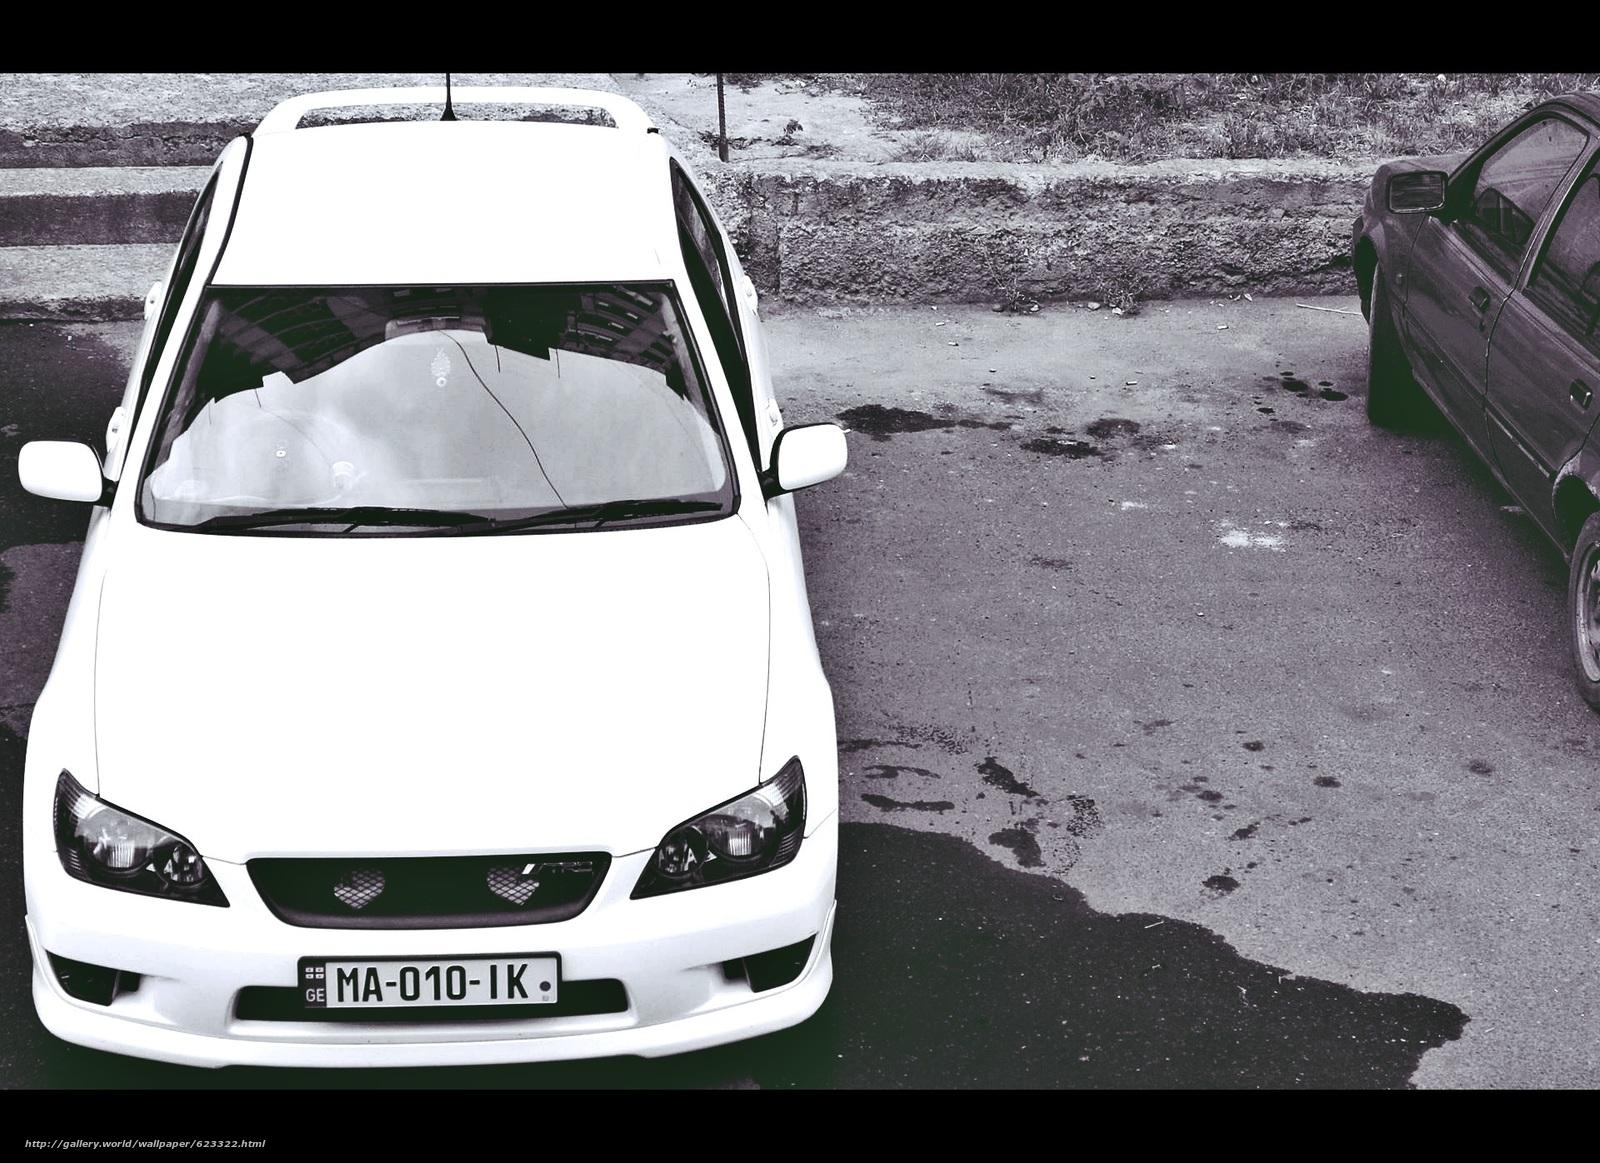 Скачать на телефон обои фото картинку на тему toyota, altezza, trd, white, car, sport, drift, разширение 1920x1396